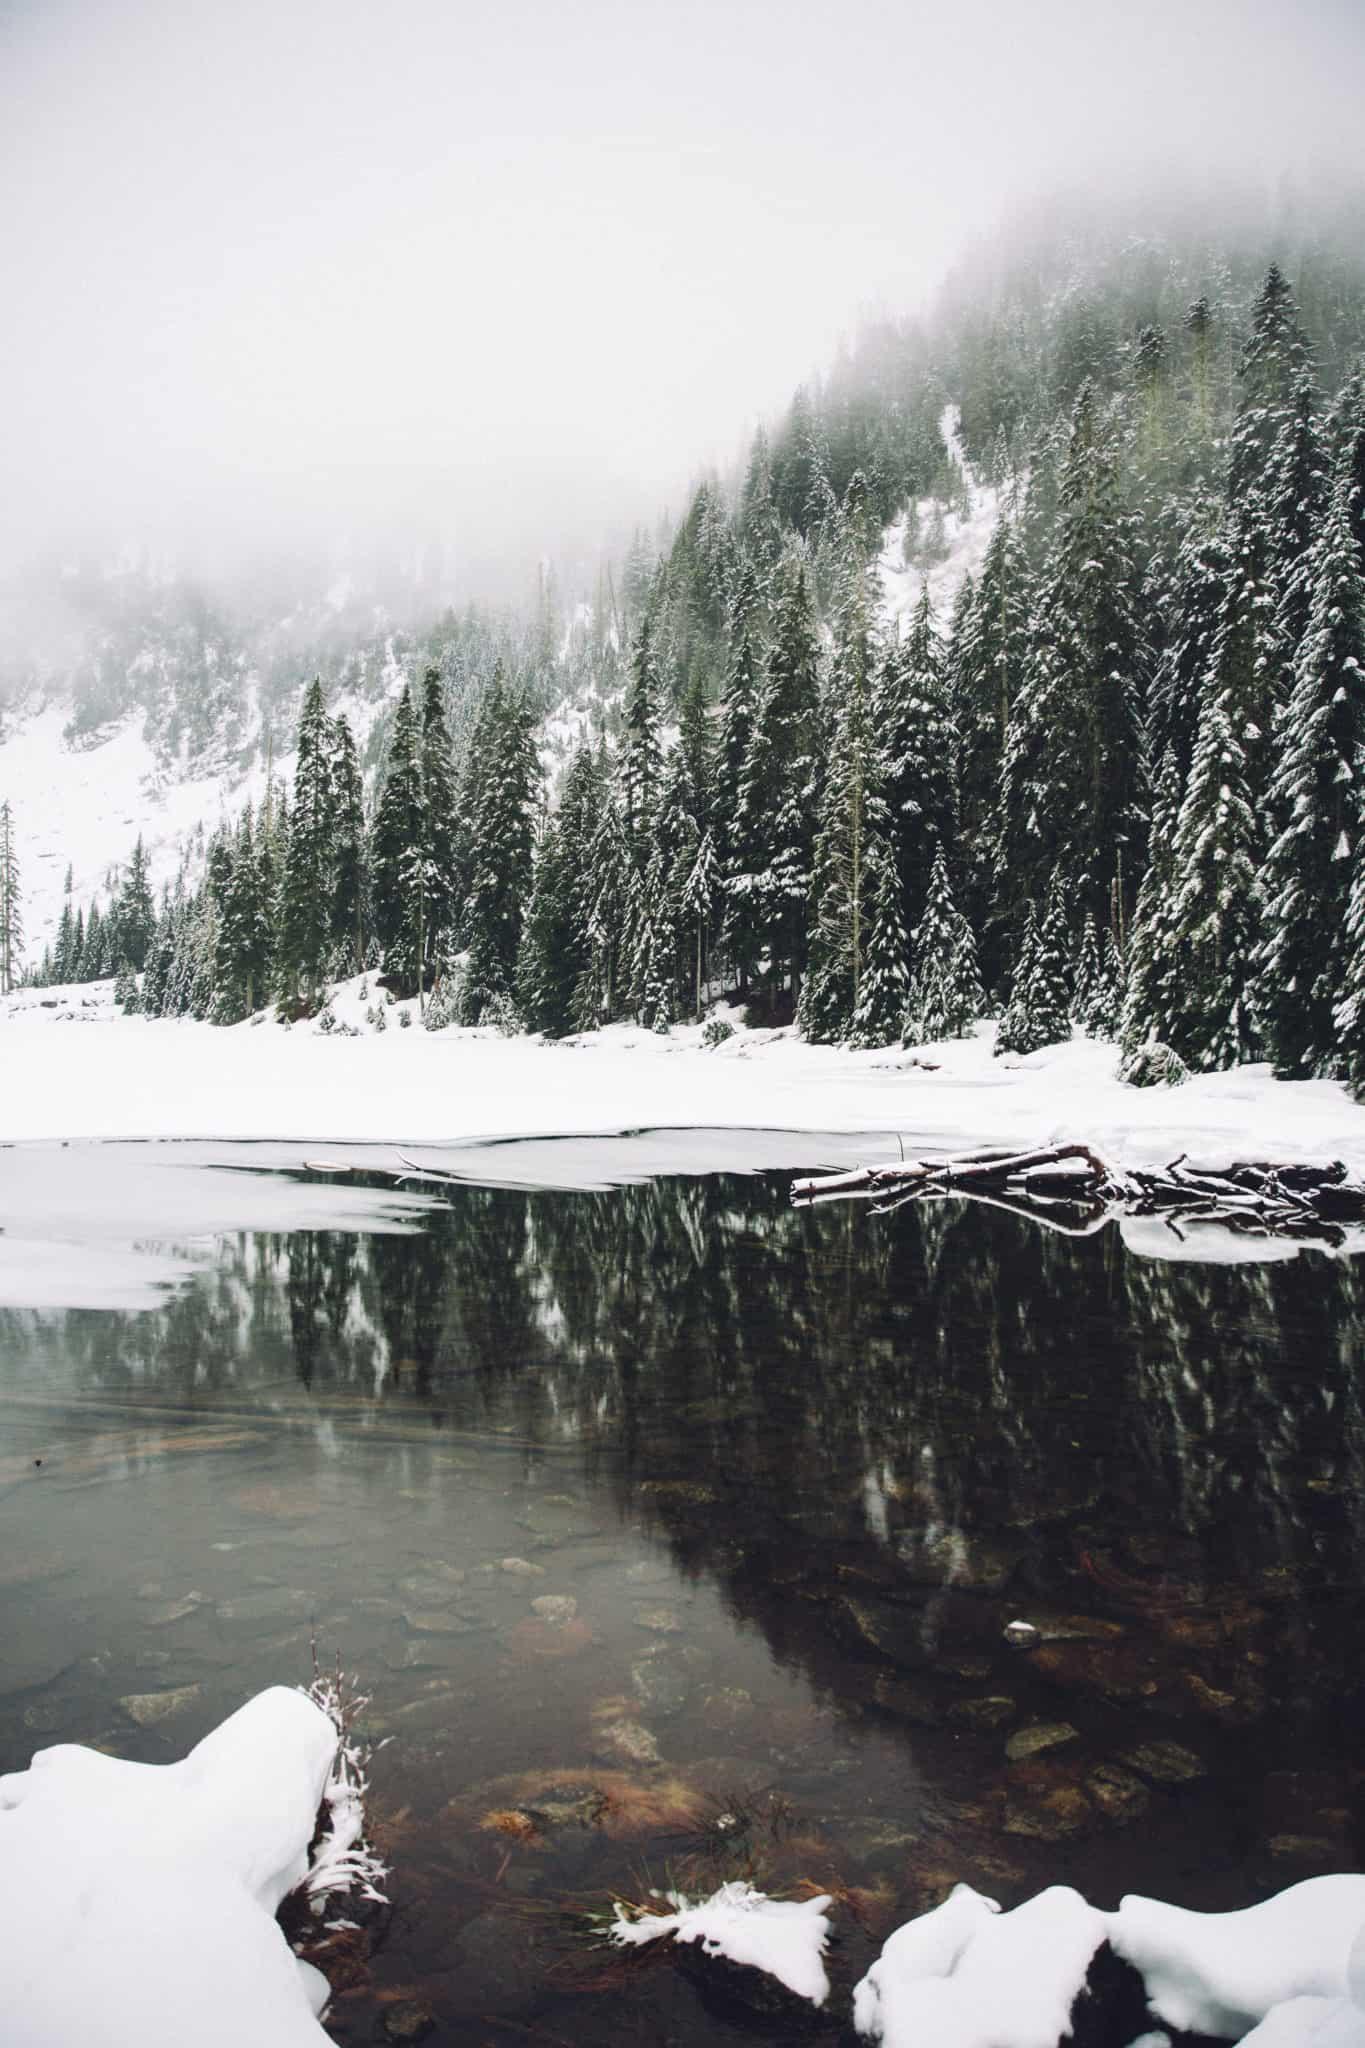 Lake Twenty Two, Washington - PNW Engagement shoot locations - TheMandagies.com